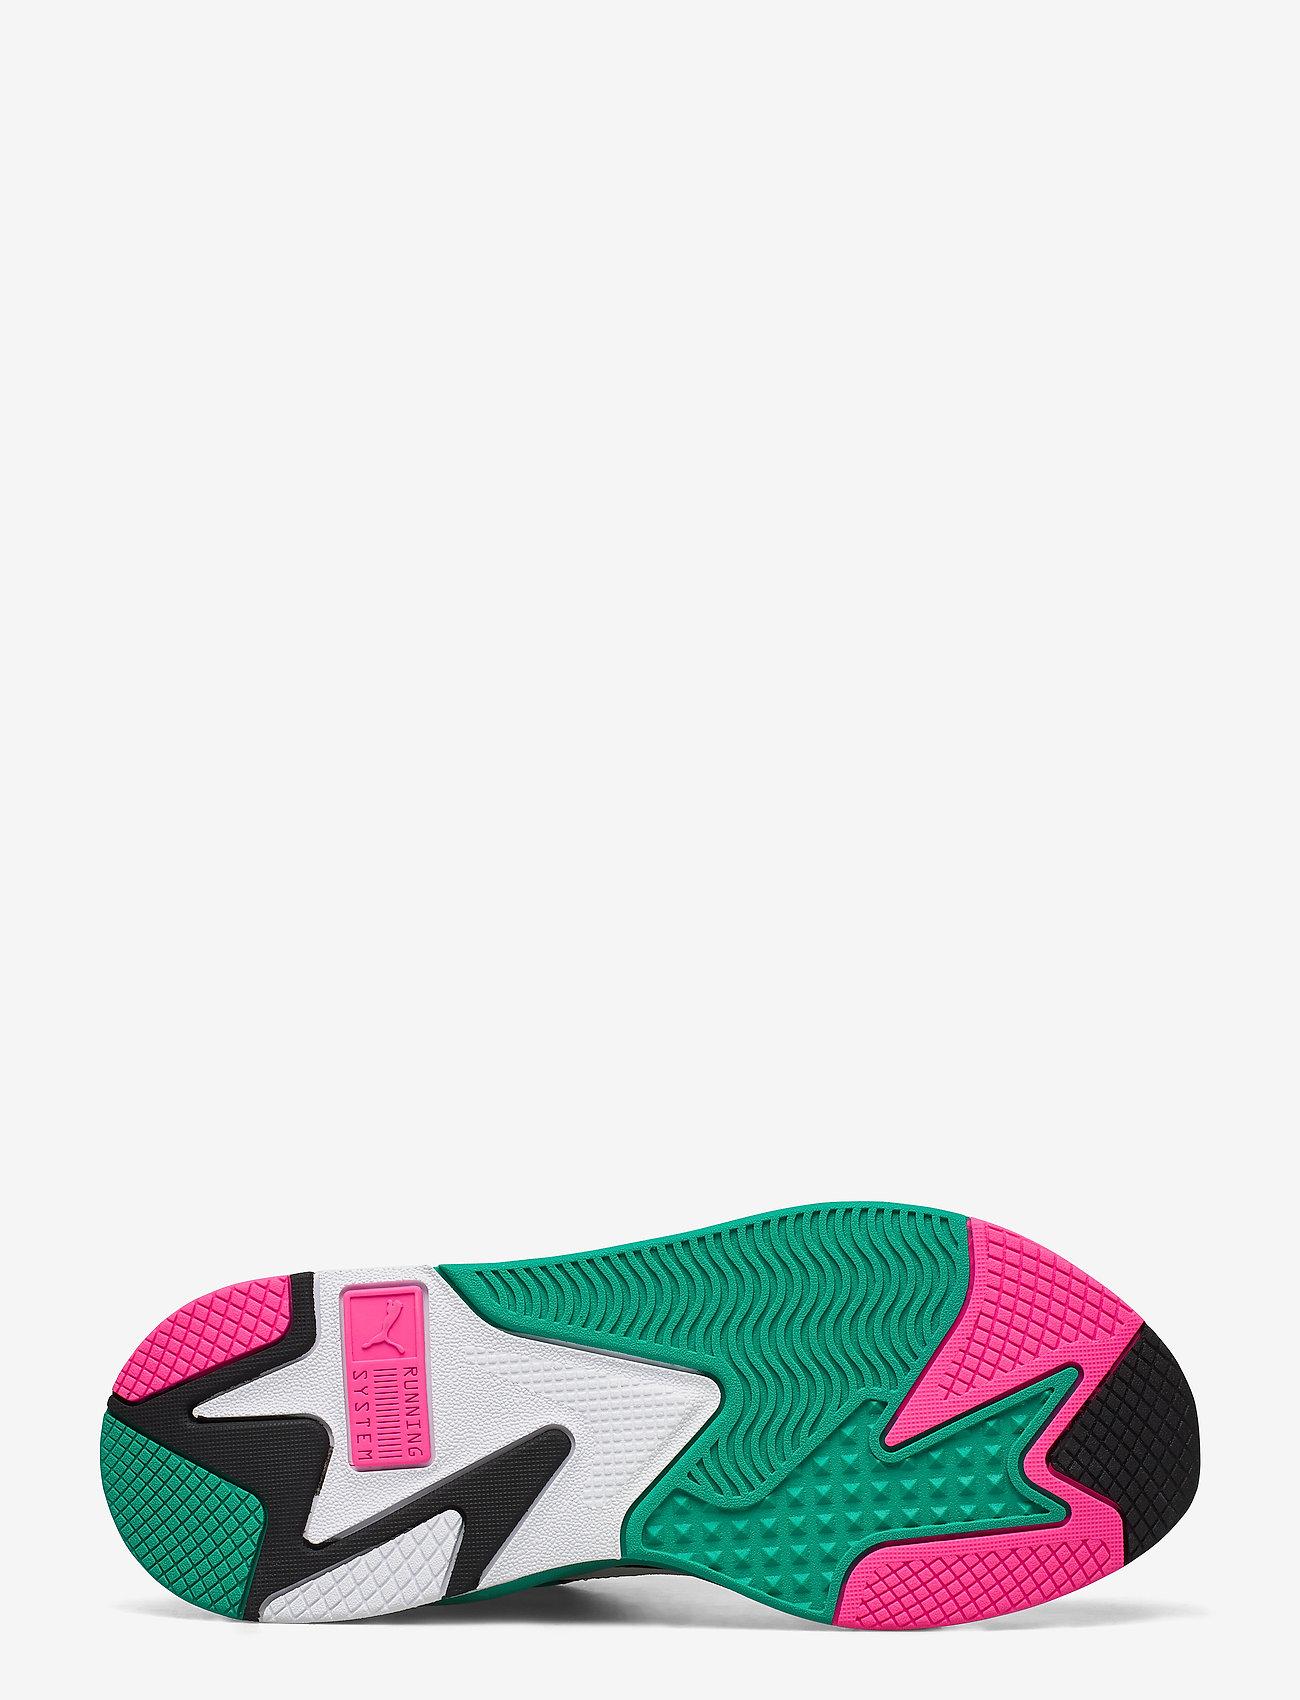 Rs-x Plastic (Puma White-fluo Pink) - PUMA